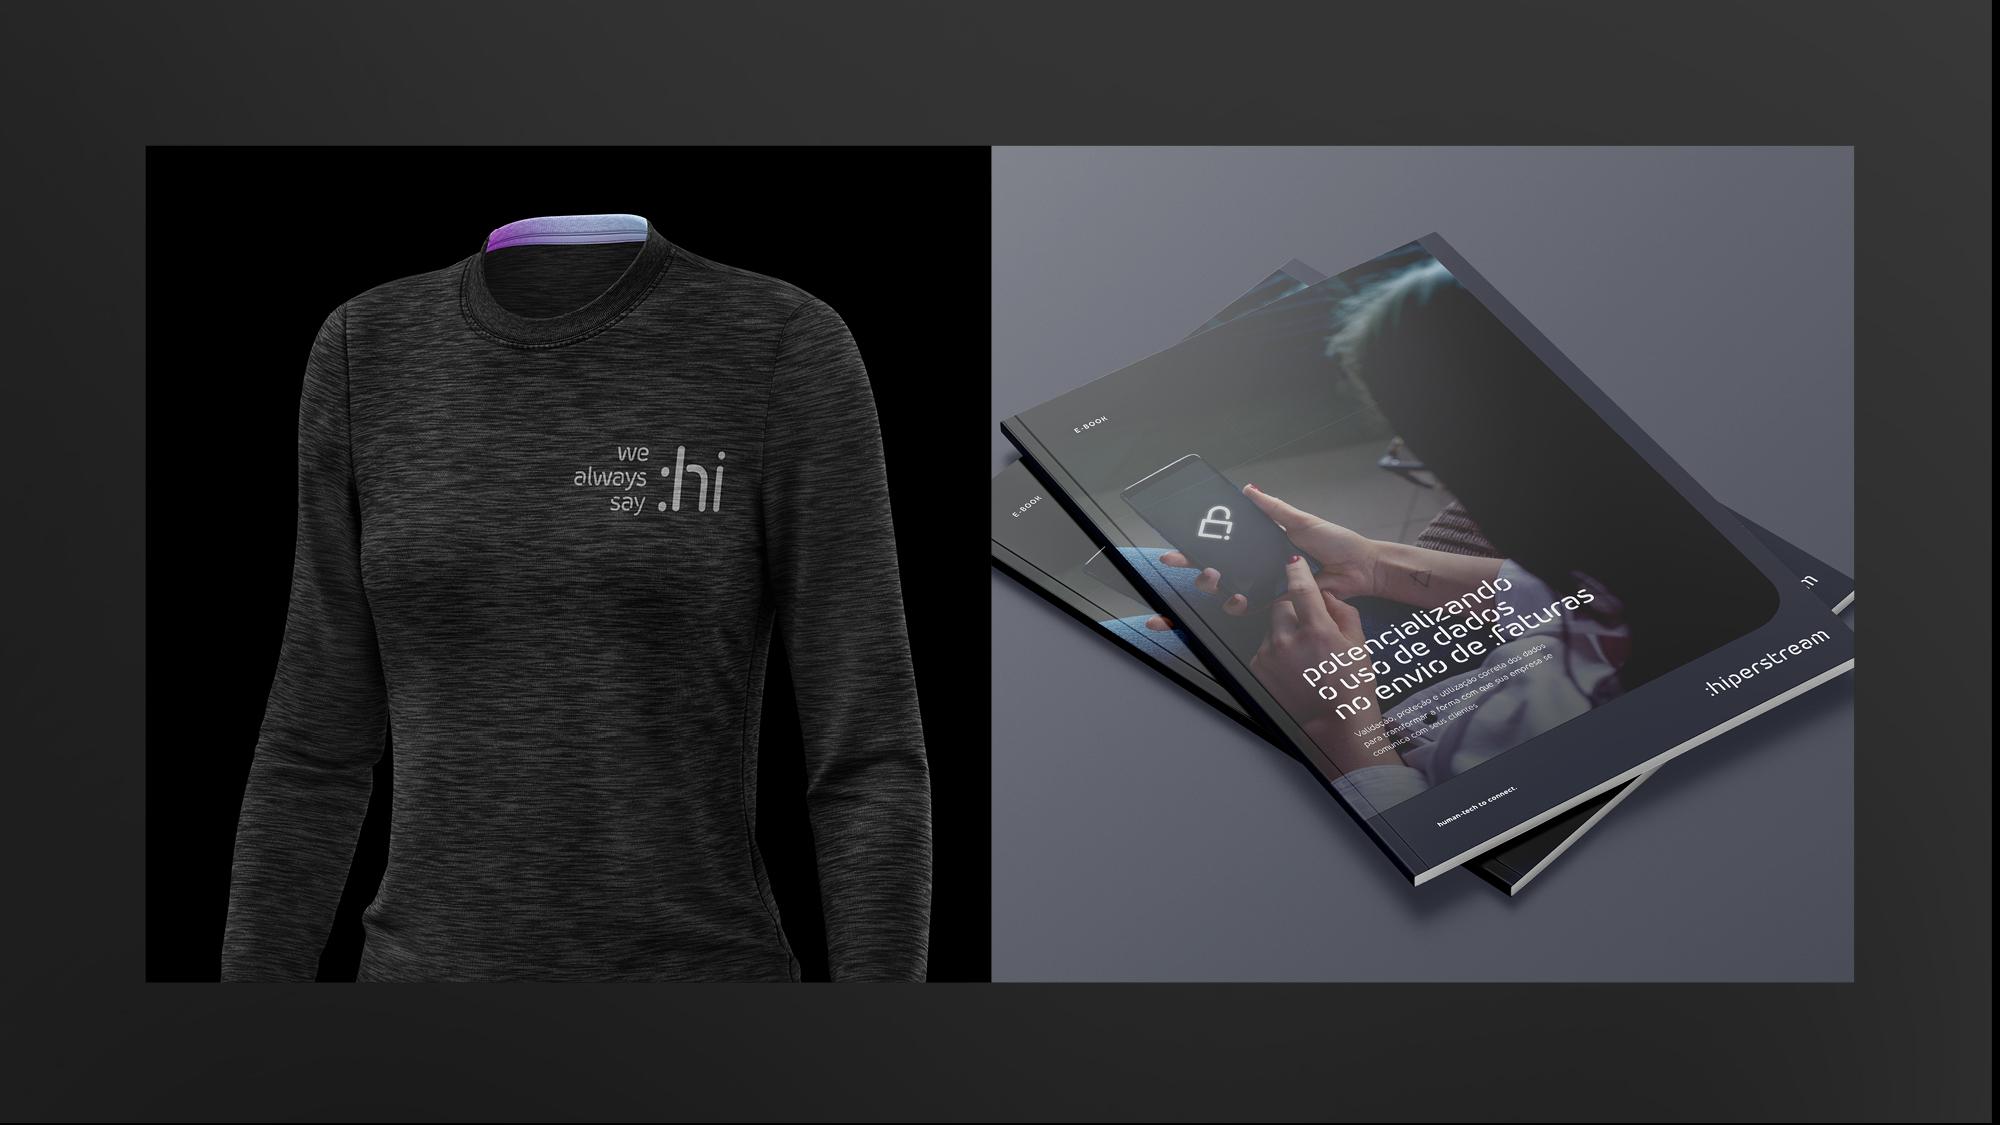 Lanatta-Branding-and-Design-Hiperstream11